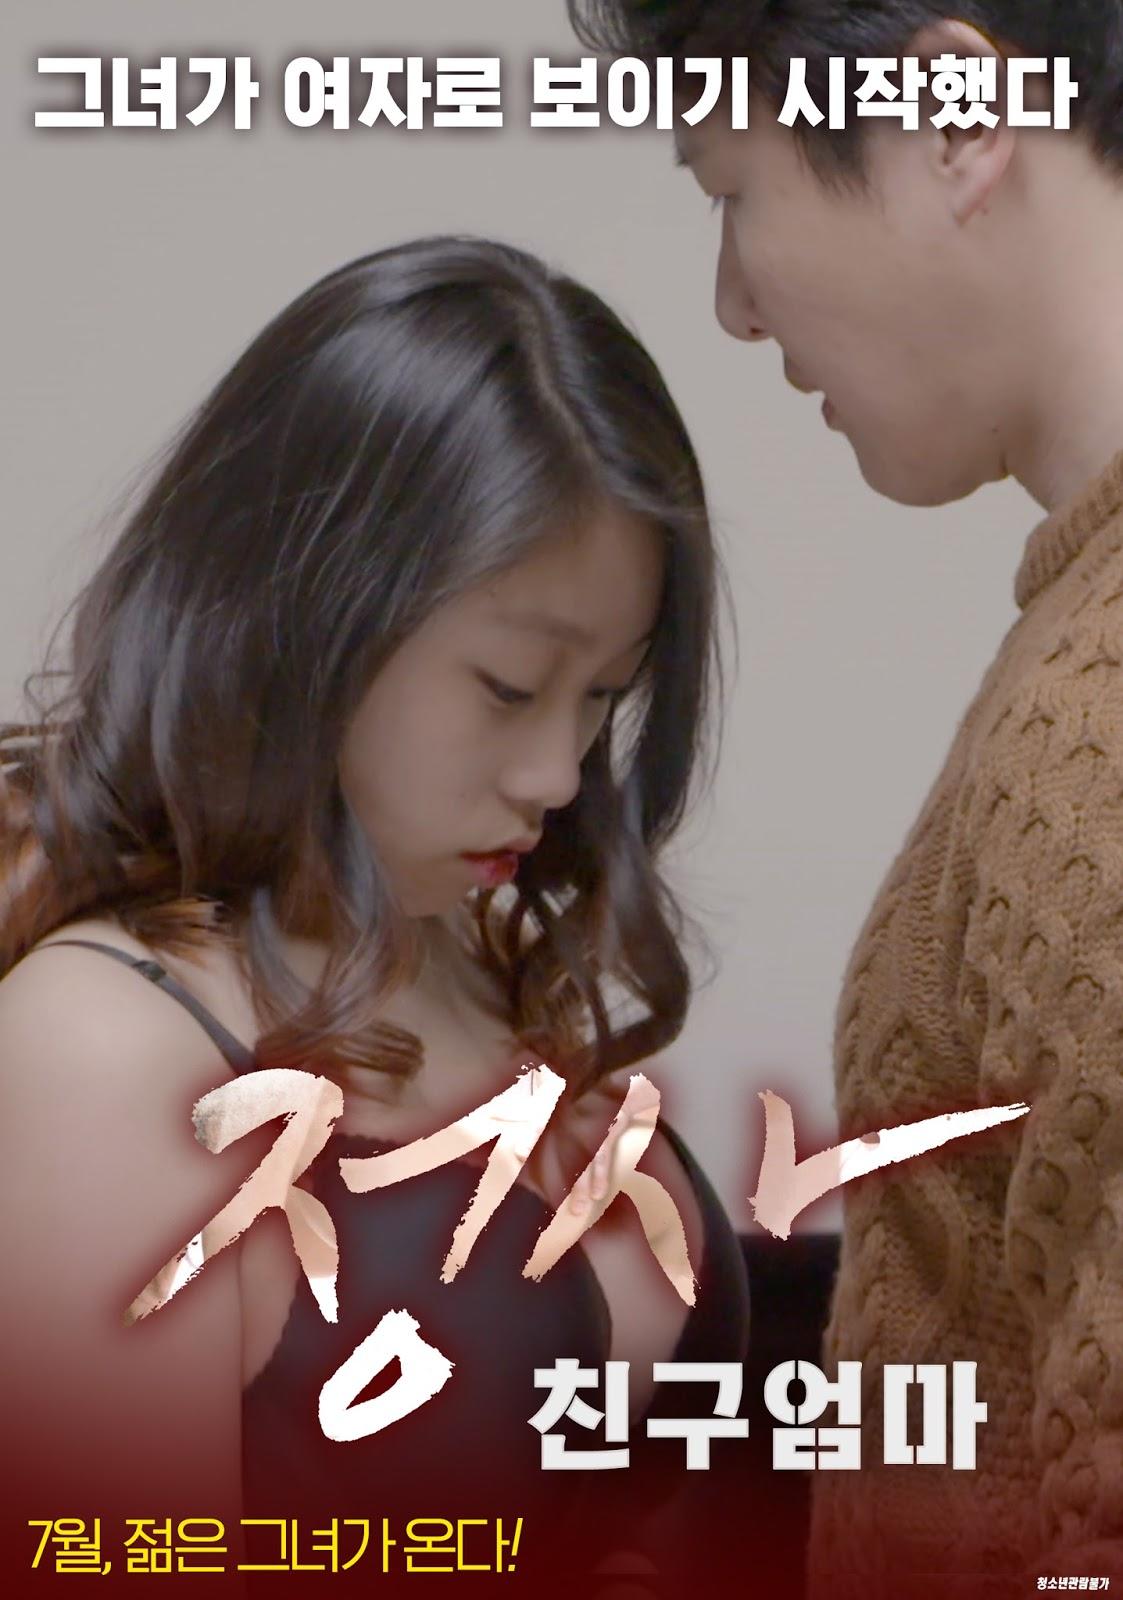 An Affair Friends Mother (2017) 정사: 친구 엄마 [เกาหลี 18+] [Soundtrack ไม่มีบรรยายไทย]